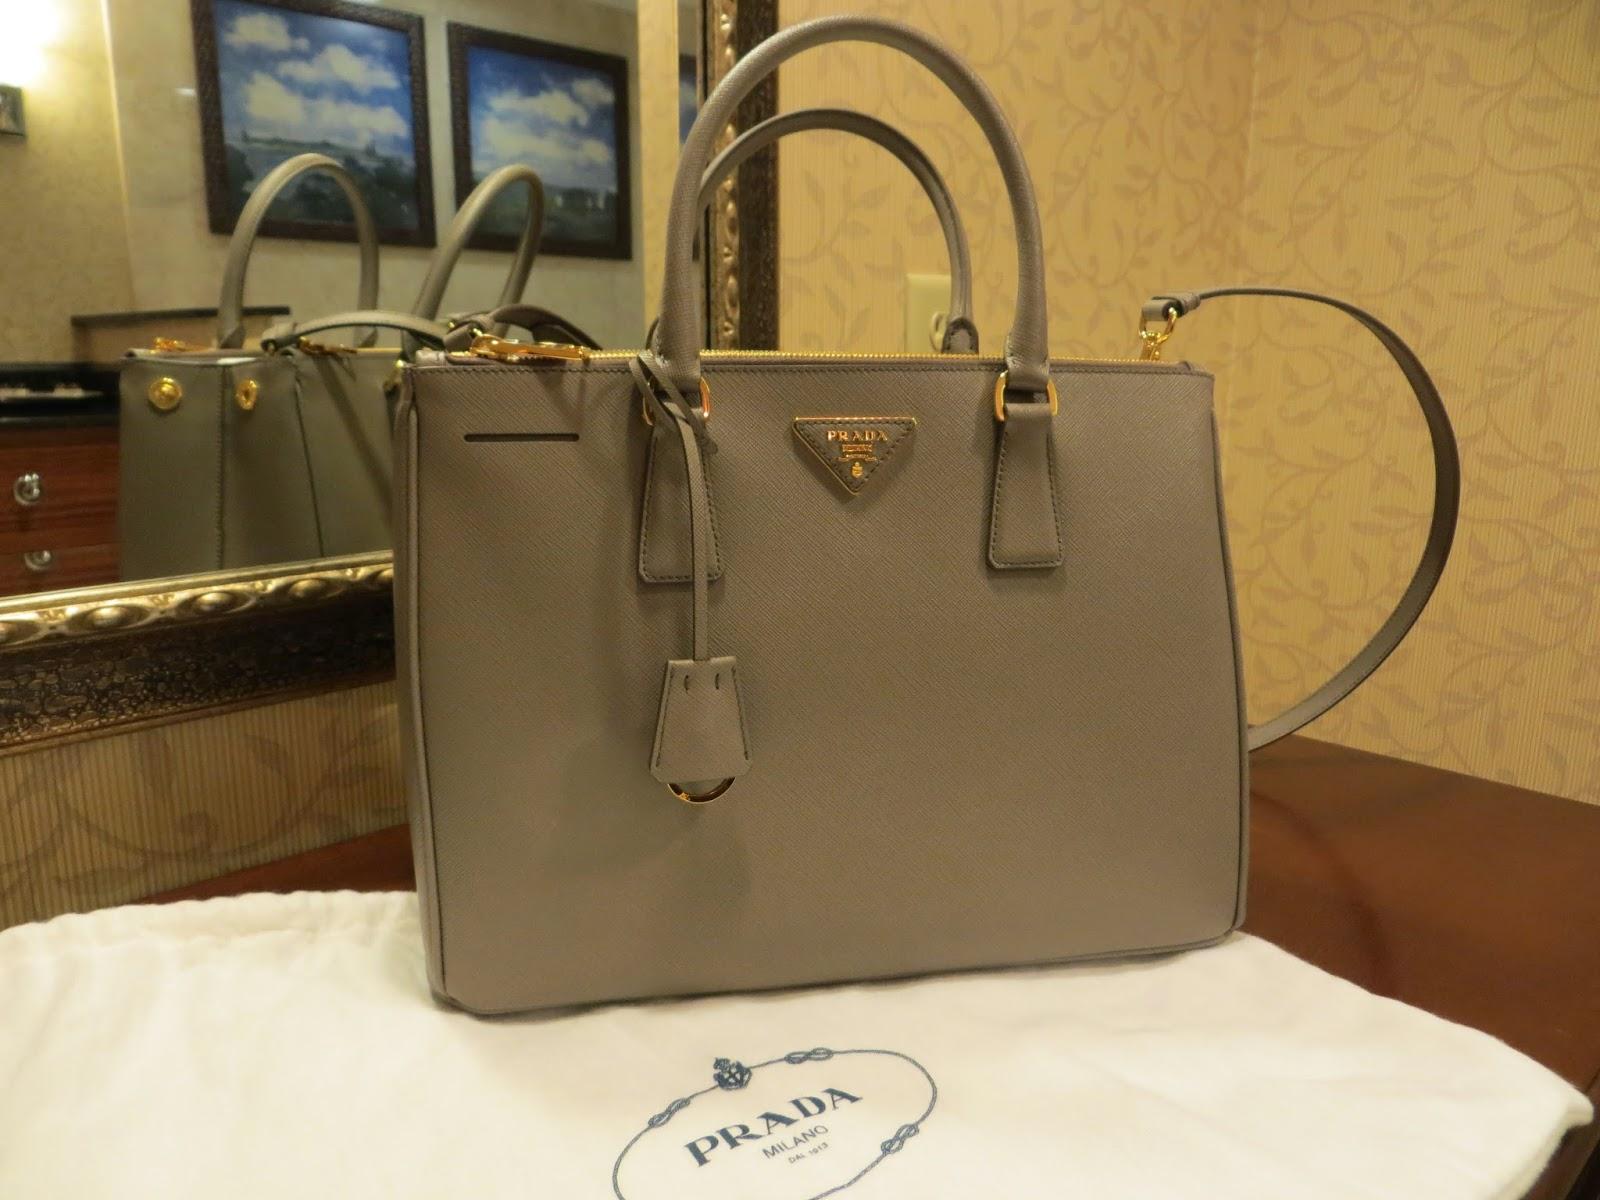 abf539416062 ... low price prada saffiano lux tote in argilla with beautiful gold  hardware 5cfe8 3f4d6